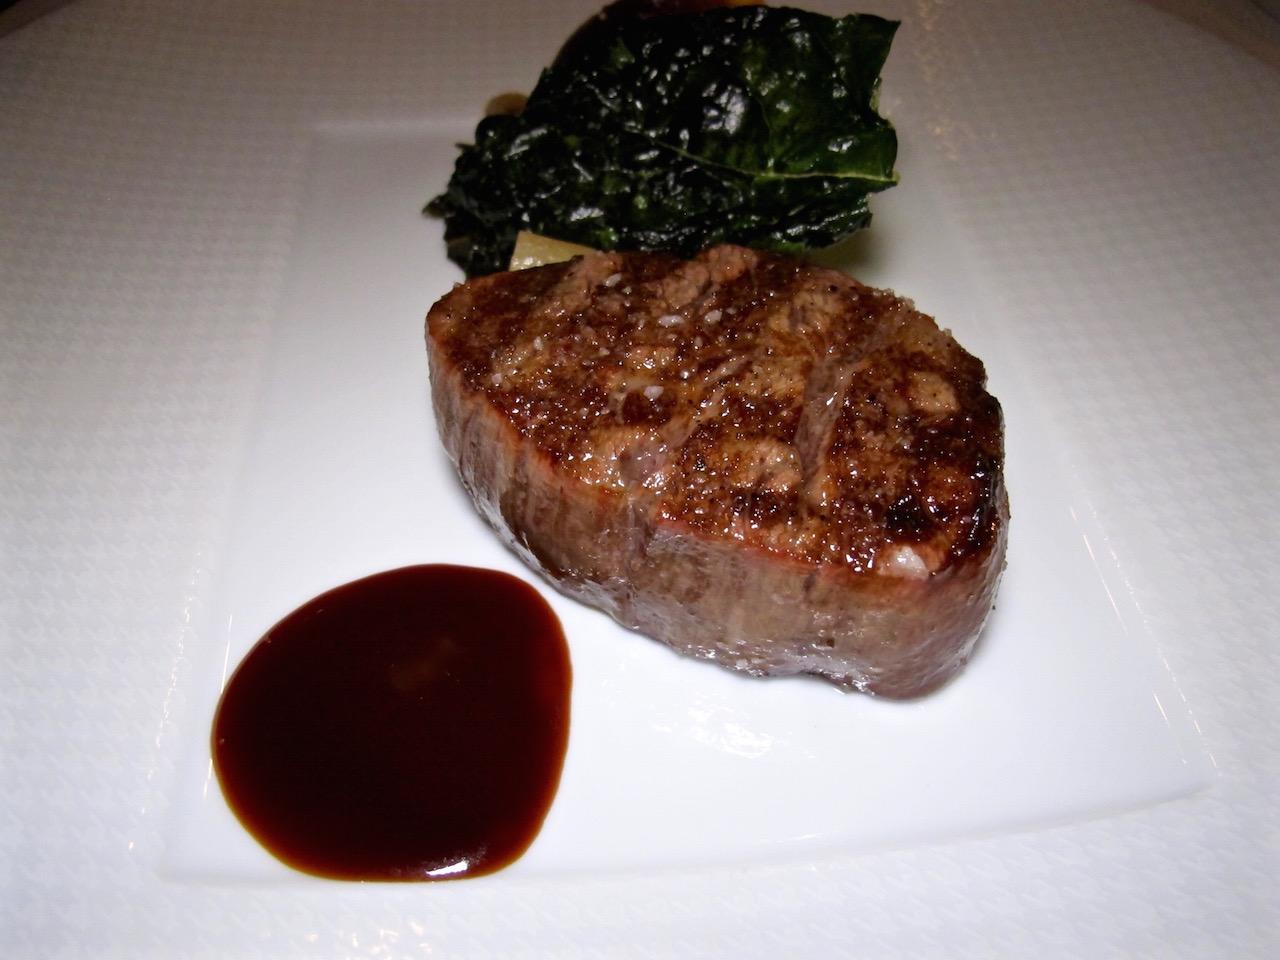 Charcoal grilled Japanese Wagyu, ris de veau dumpling, braised collard greens, garden salsify and sauce bordelaise